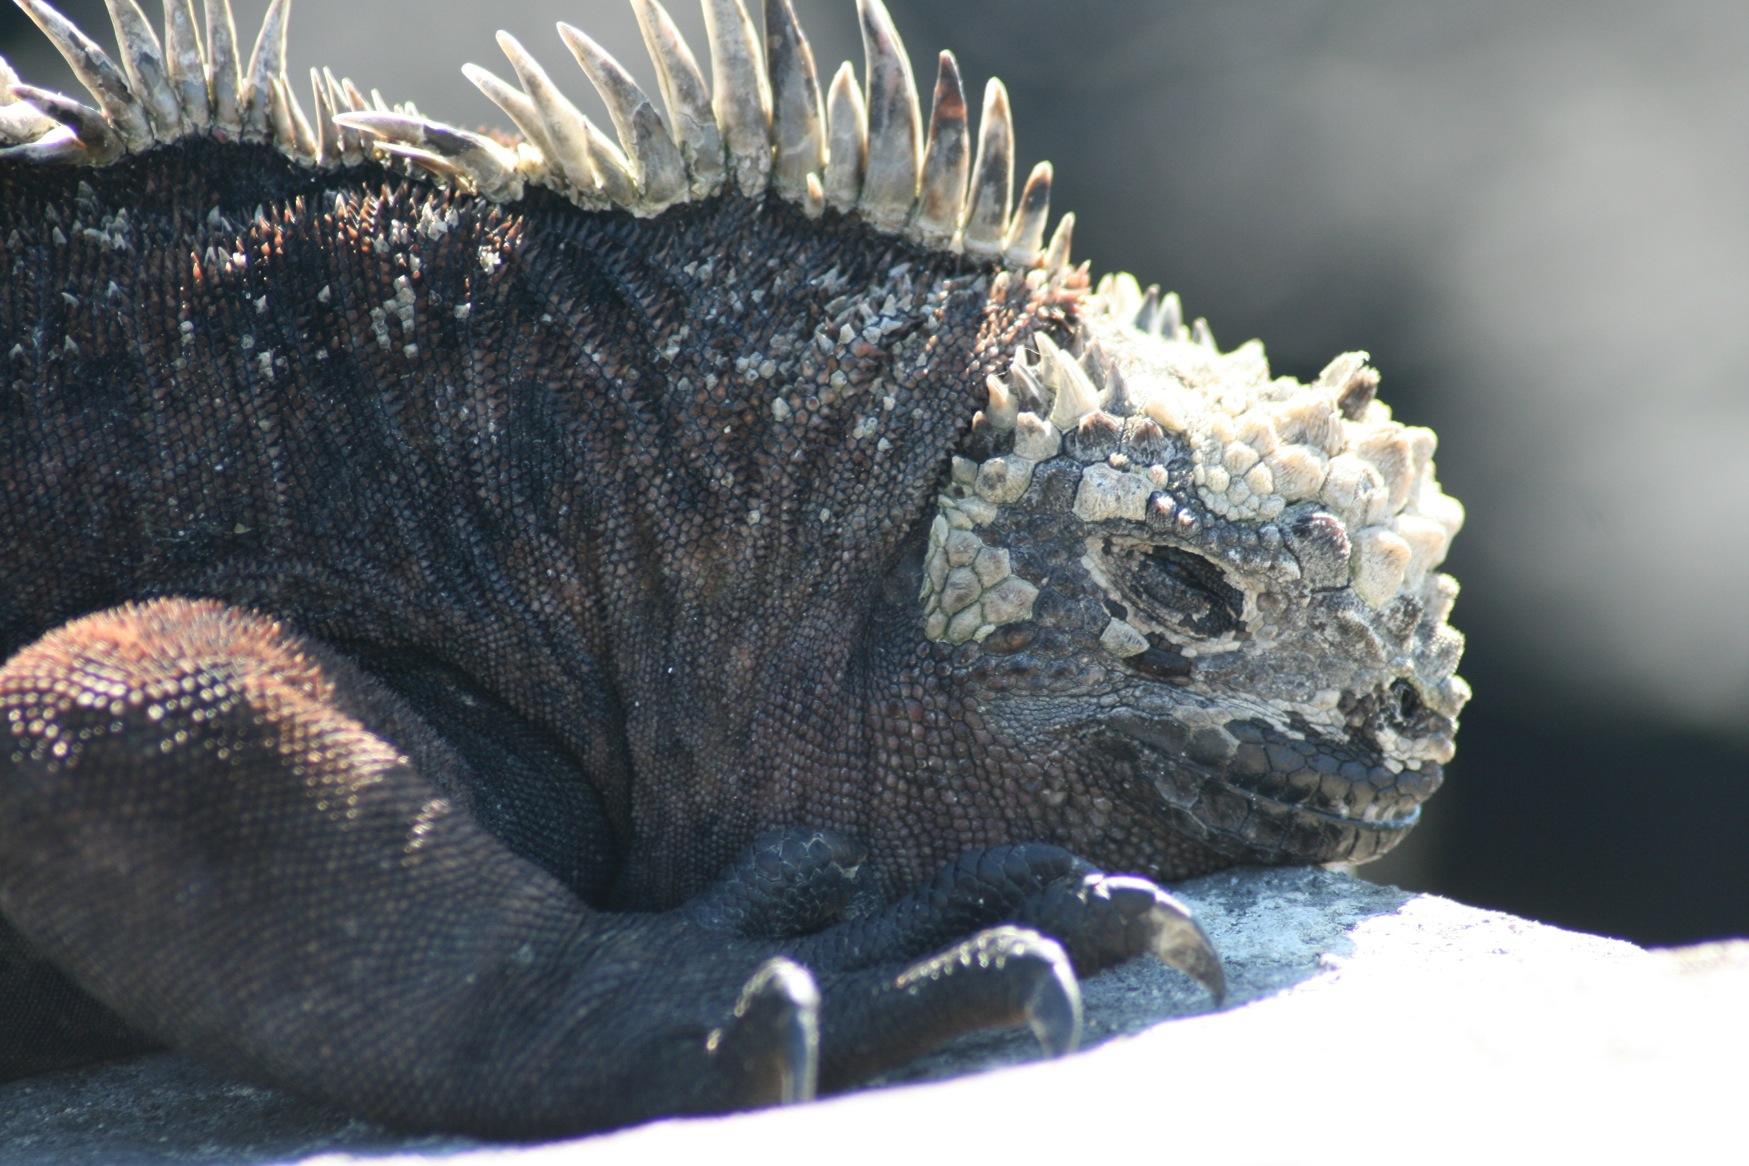 Gal 2011 marine iguana with horny solidified saliva.JPG